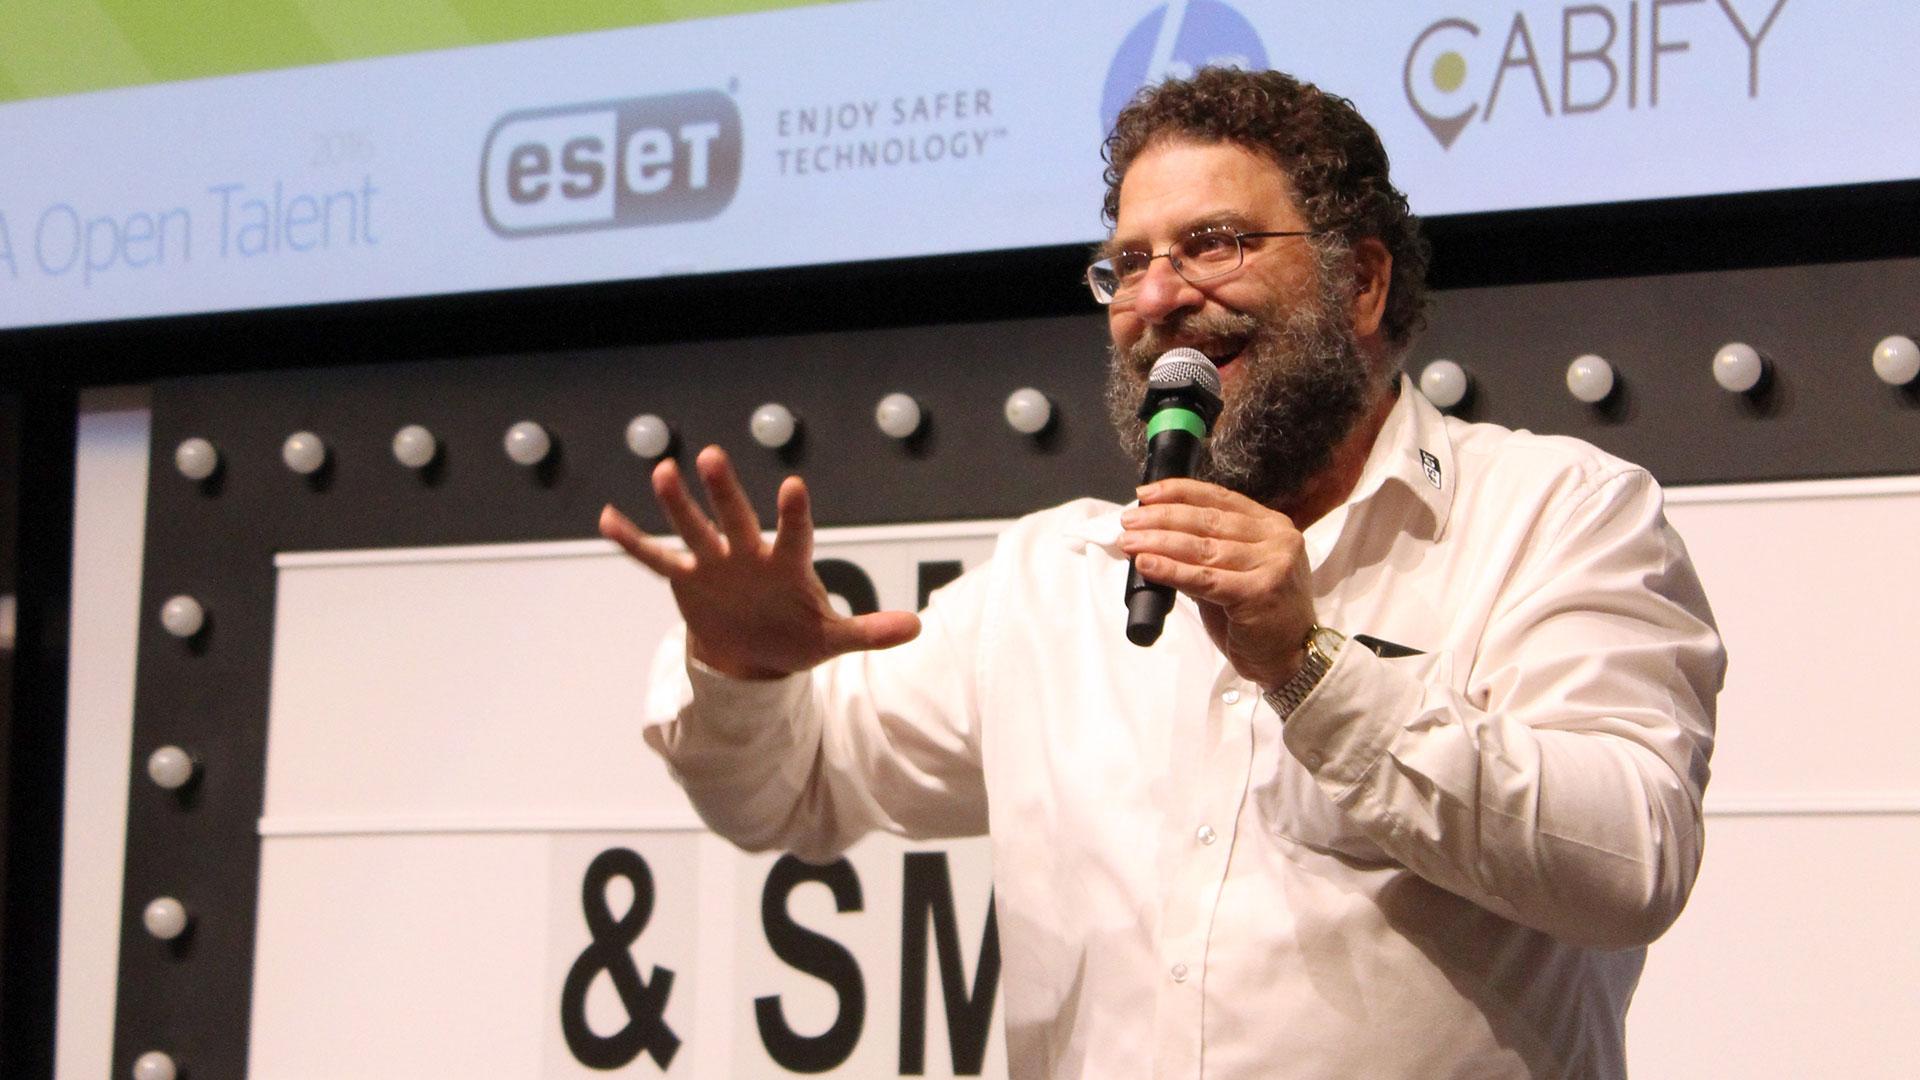 tpnet-small-smart-2016-evento-startups-smarttalks-fernando-delacuadra-eset